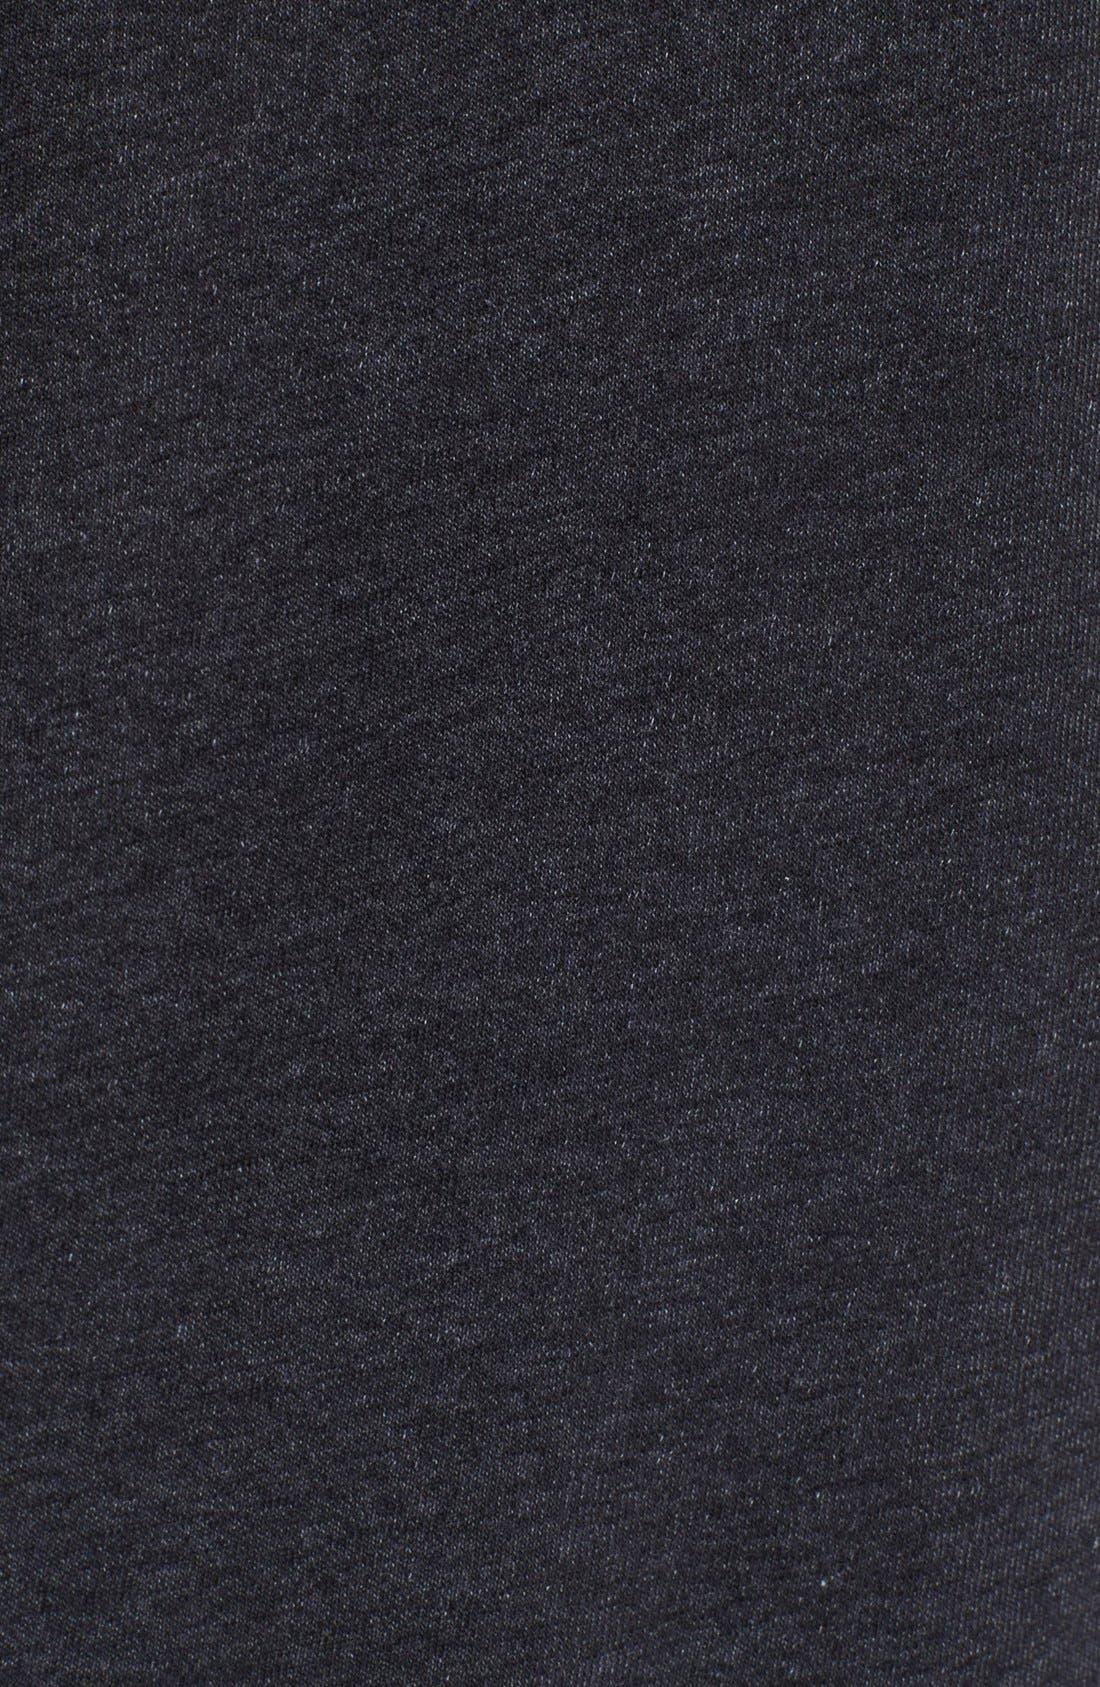 Alternate Image 3  - Wildfox 'Oo La La' Sweatshirt